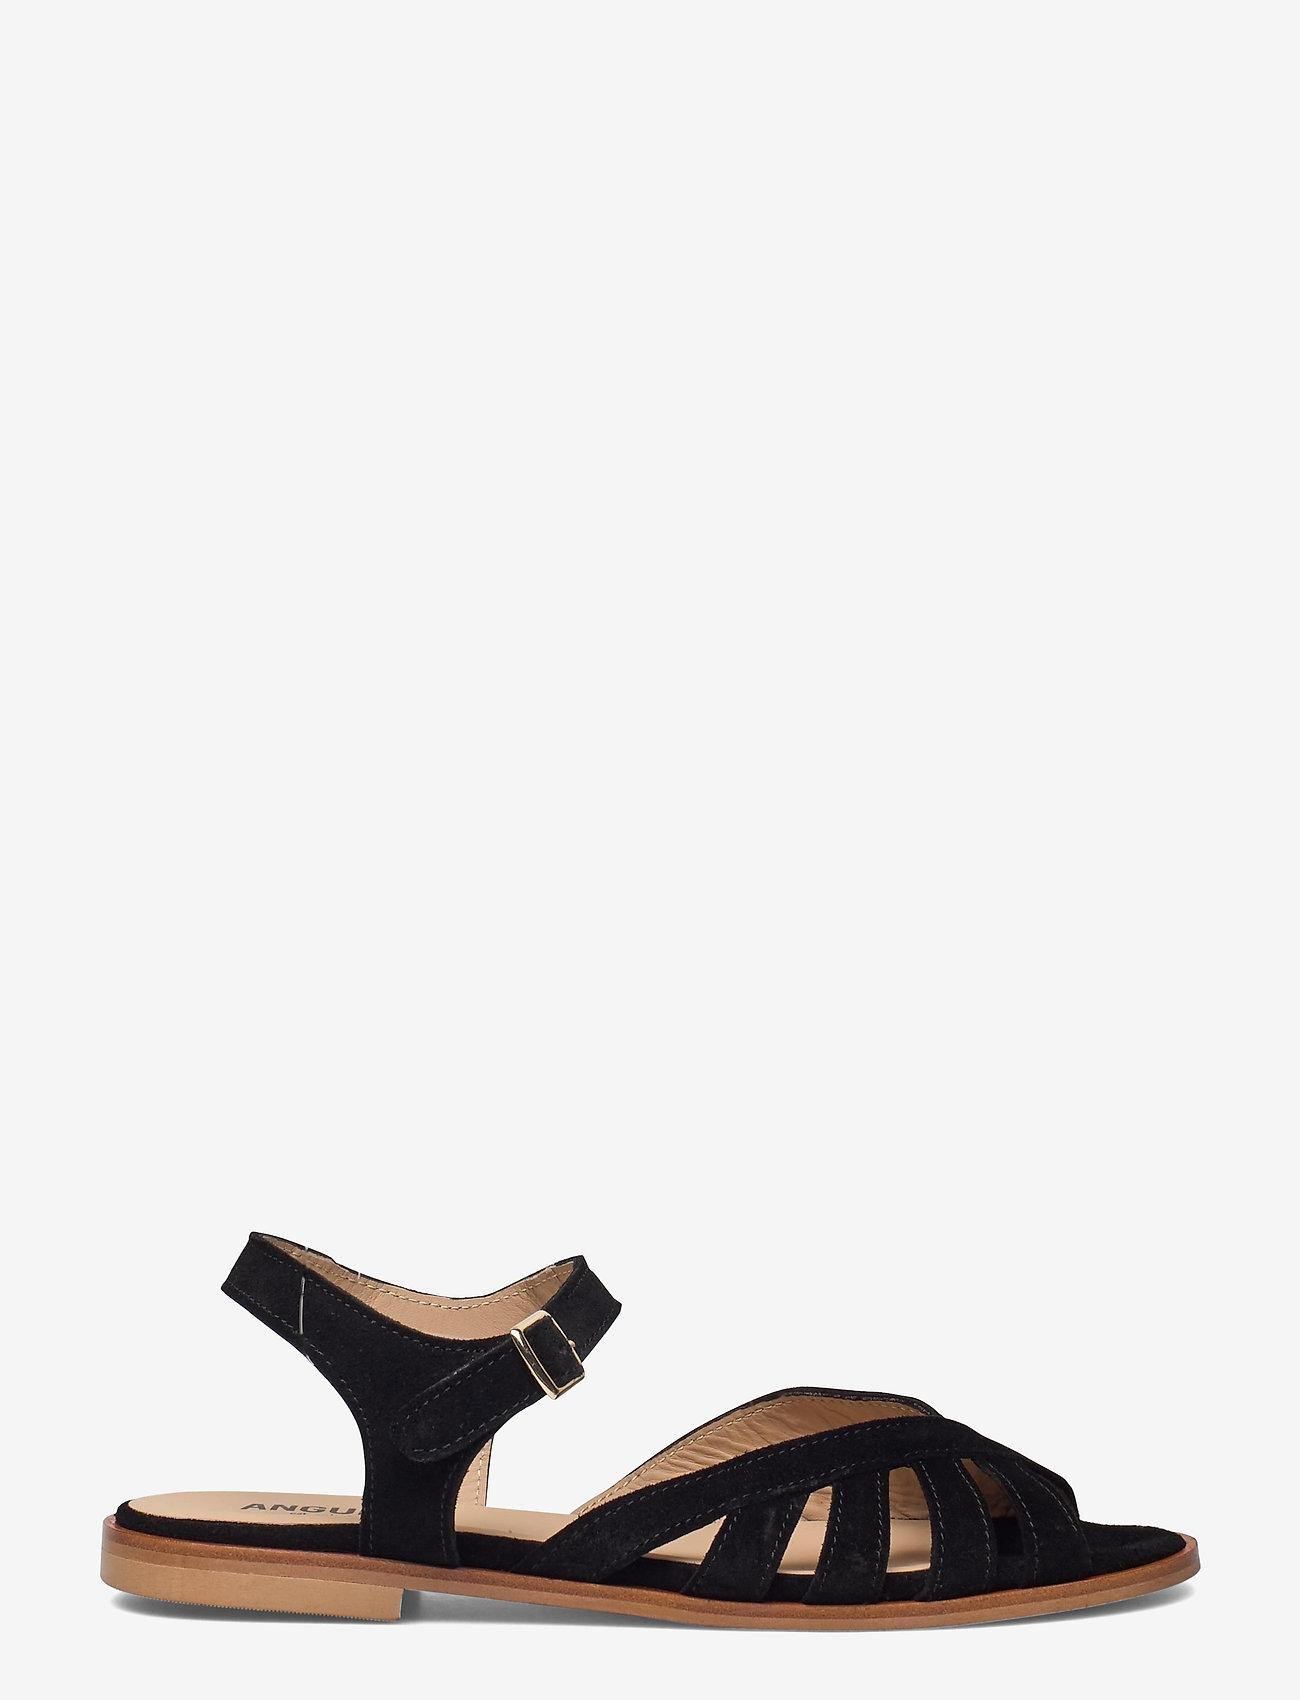 ANGULUS - Sandals - flat - open toe - op - flache sandalen - 1163 black - 1